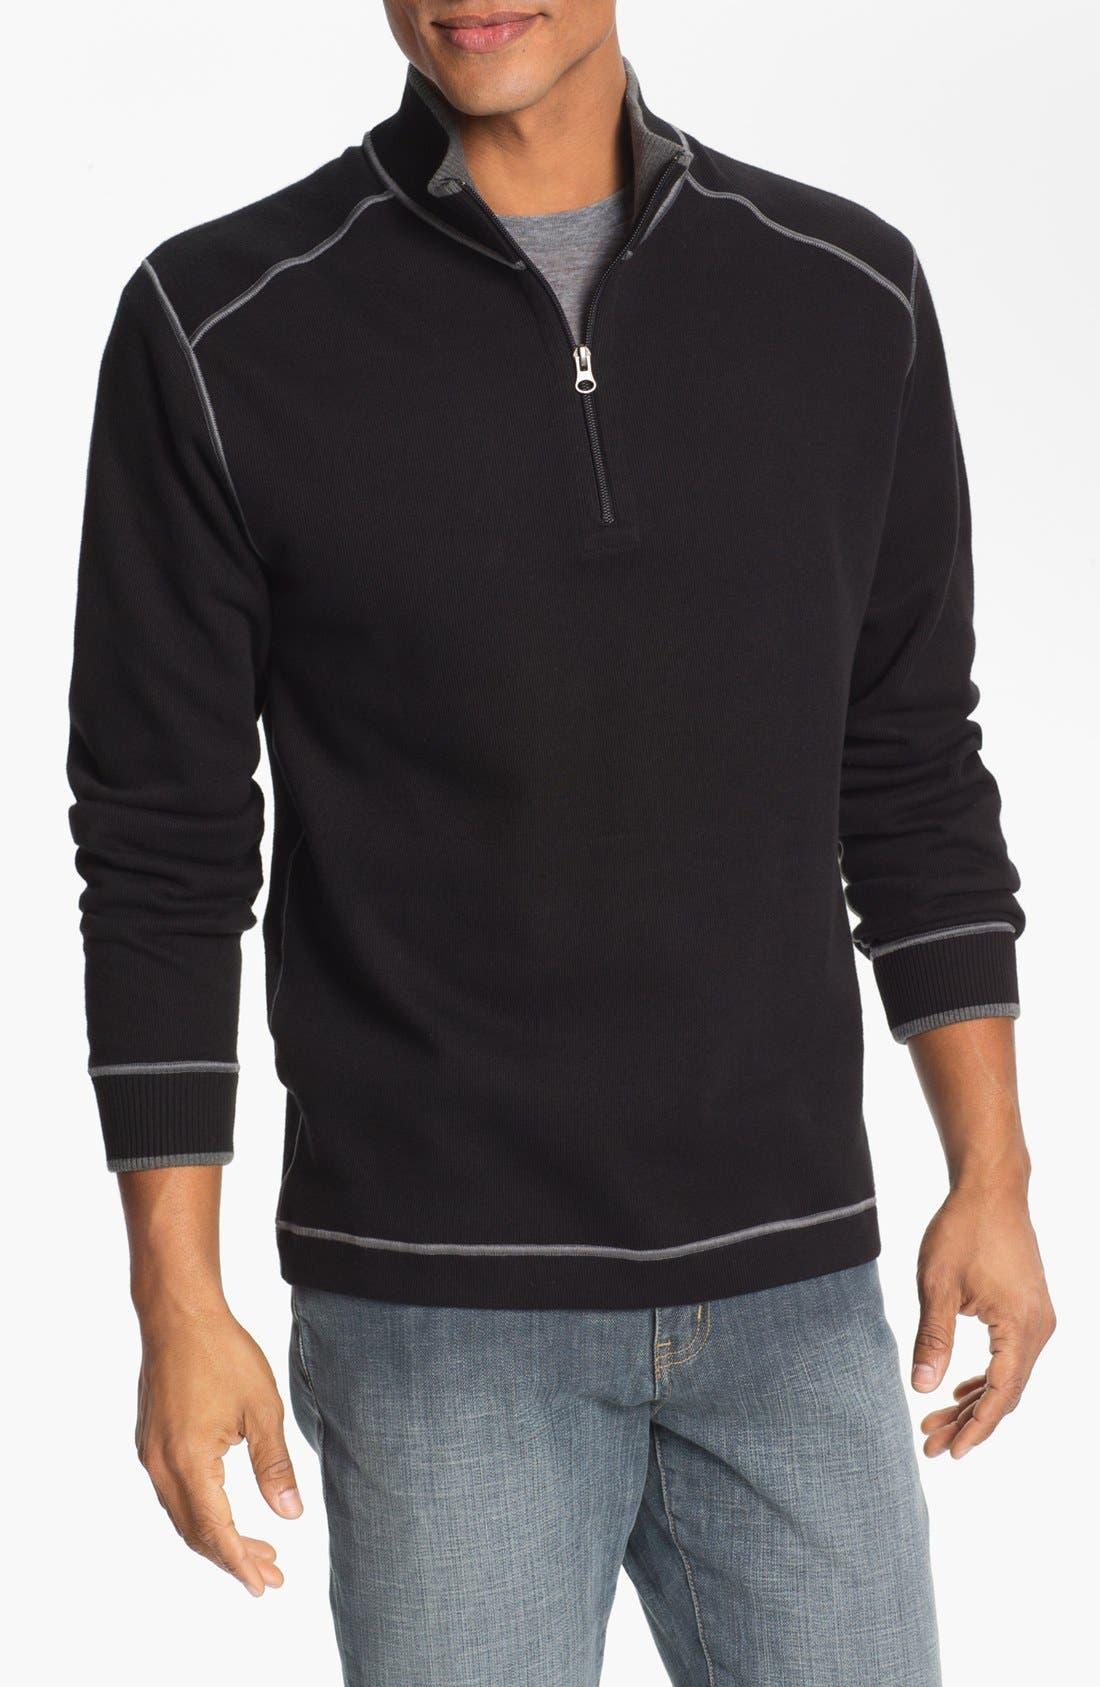 Alternate Image 1 Selected - Cutter & Buck Regular Fit Quarter Zip Sweater (Regular & Big)